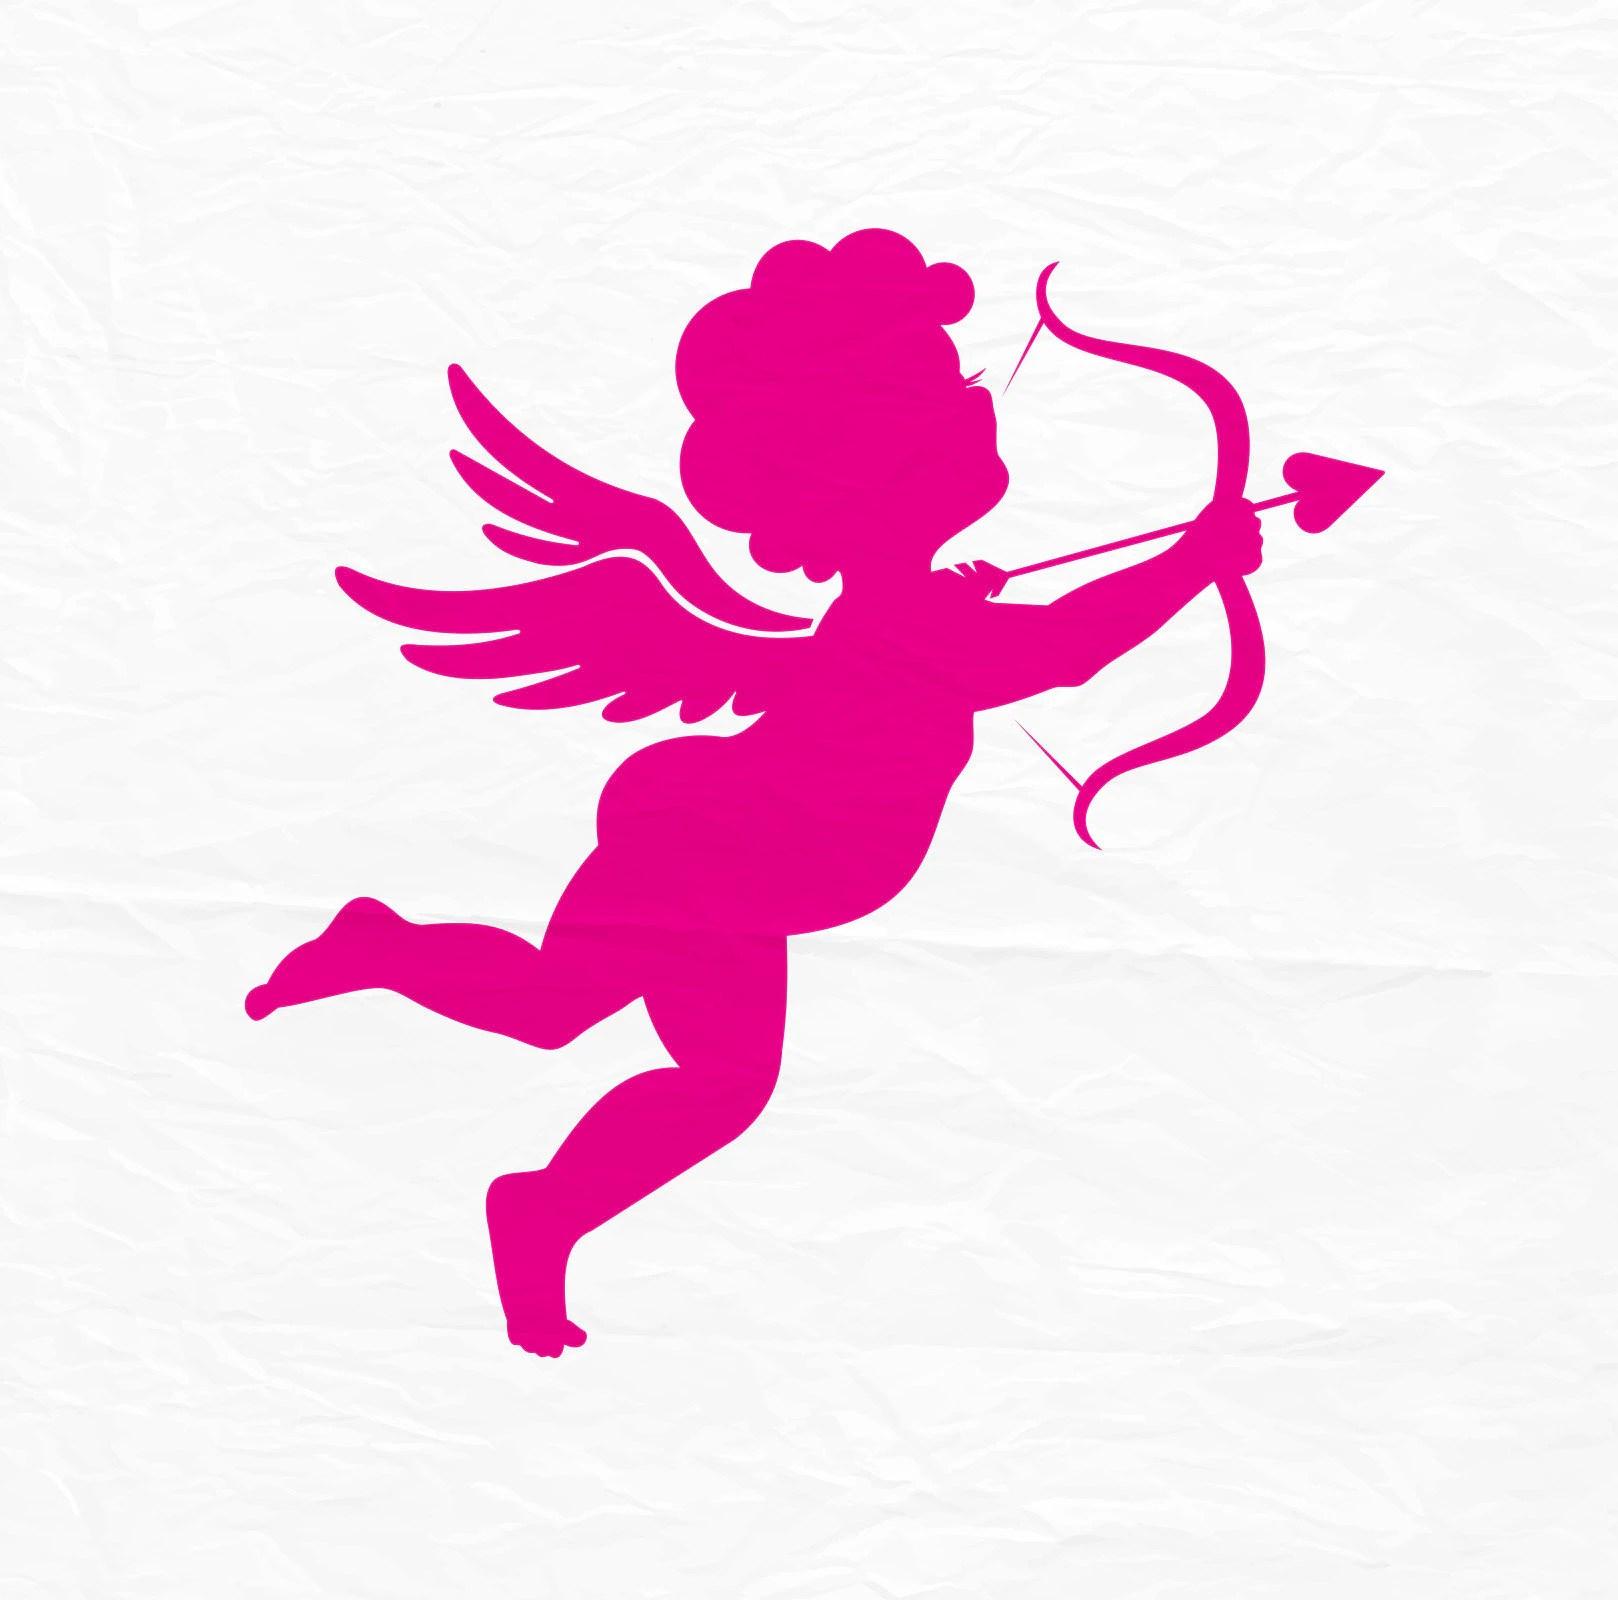 Cupid SVG Cupid Silhouette Love SVG Couple SVG Cupid Cut